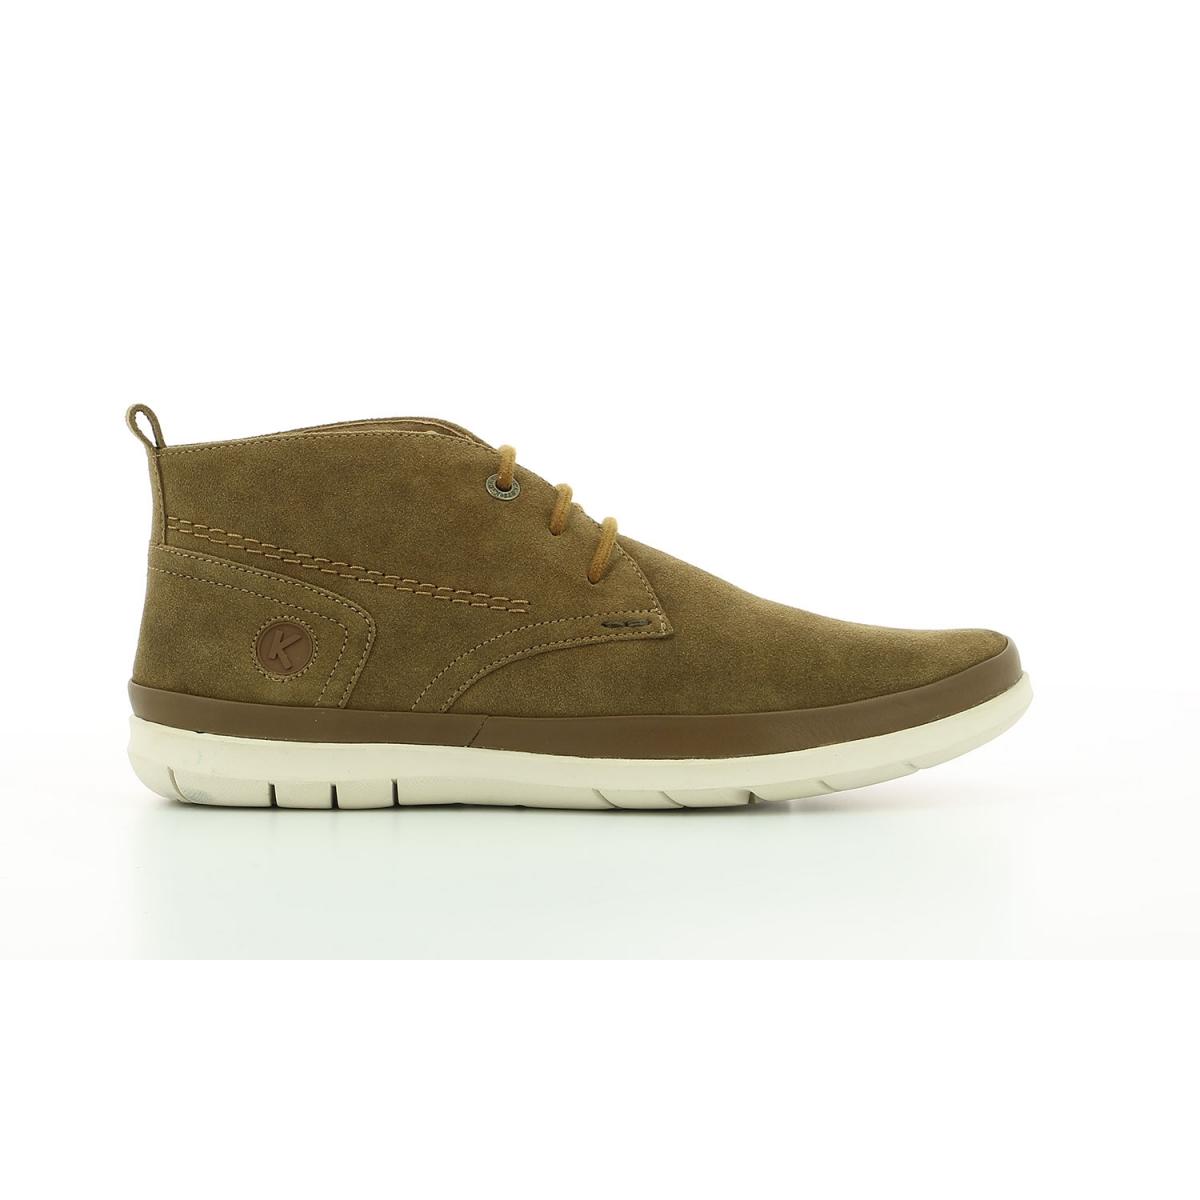 Boots Homme Layton marron kaki Chaussures Homme Kickers